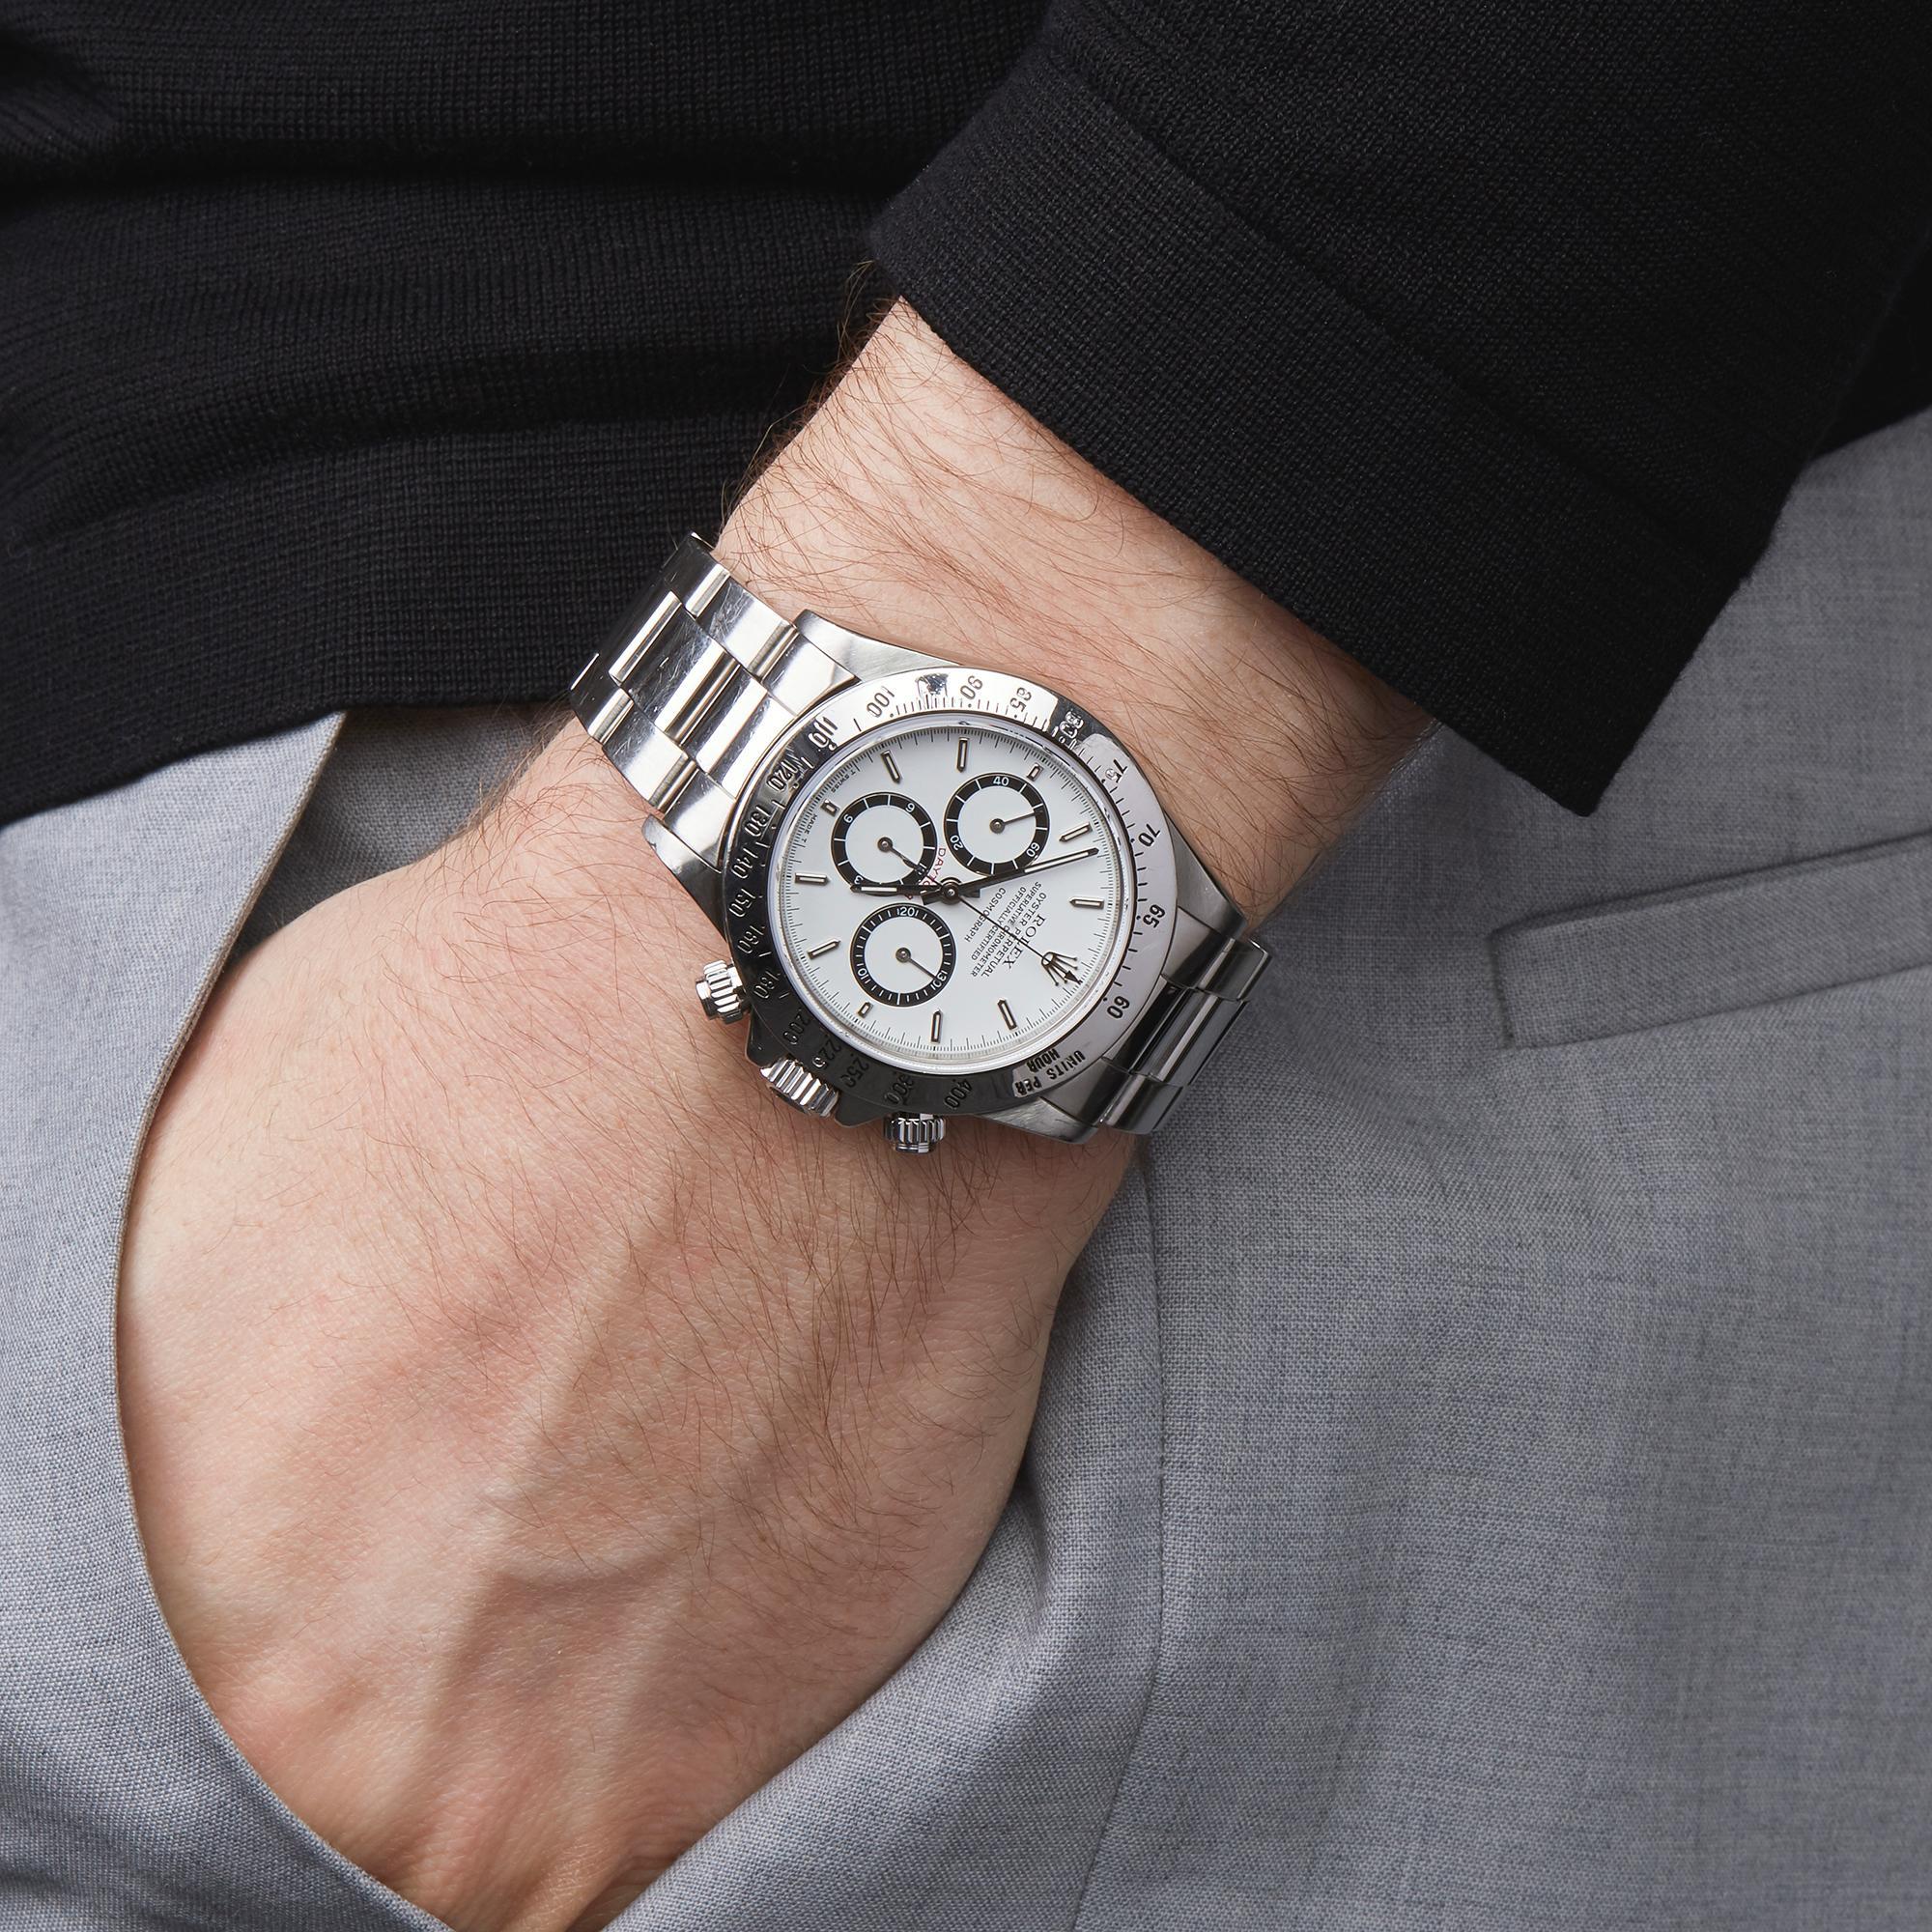 Rolex Daytona Floating Cosmograph Stainless Steel 16520 Wristwatch